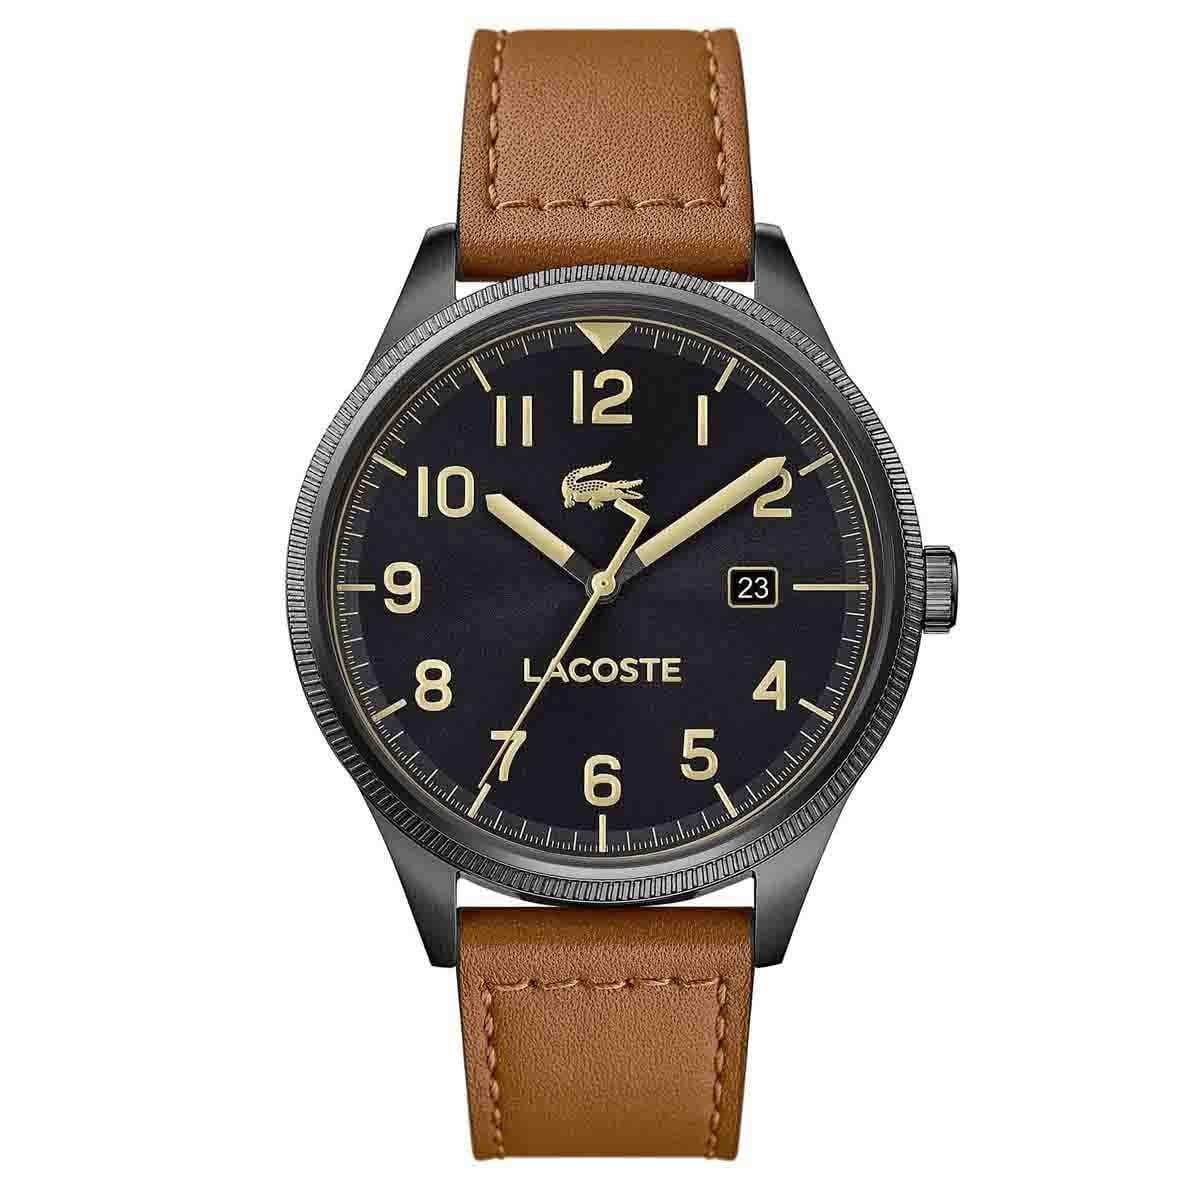 Reloj para Caballero Continental Color Café Lacoste